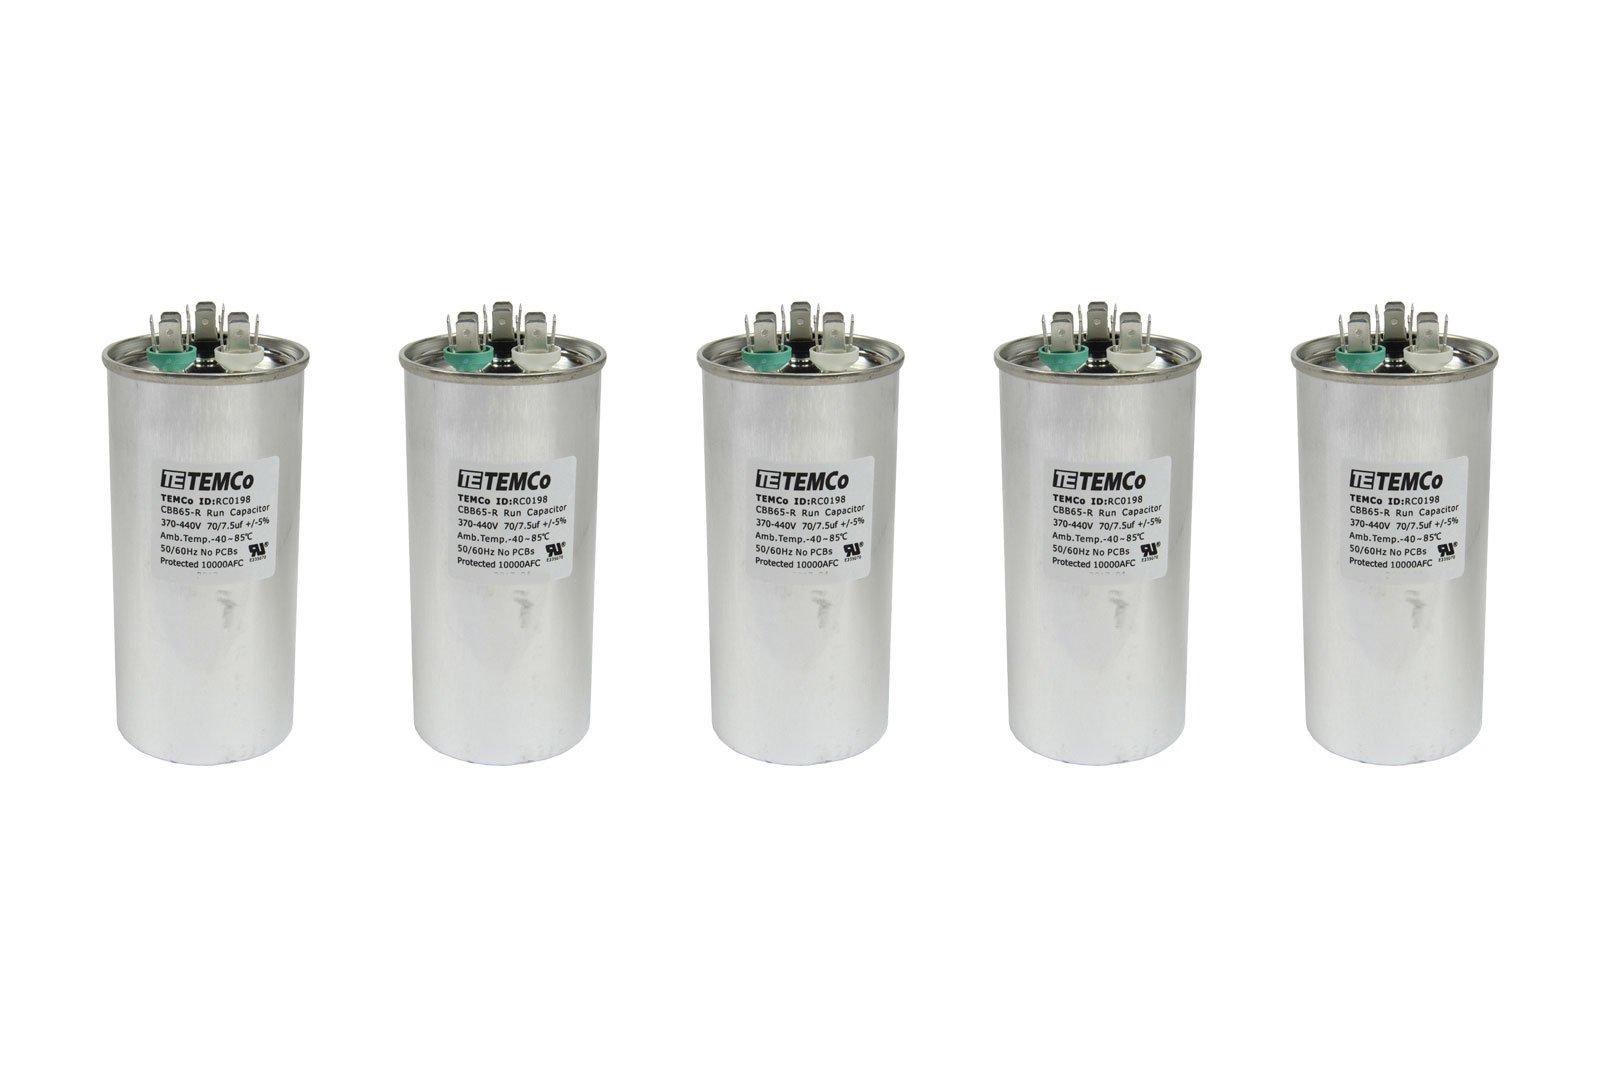 TEMCo 5 LOT Dual Run Capacitor RC0199-70/7.5 mfd 370 V 440 V VAC volt 70+7.5 uf AC Electric Motor HVAC